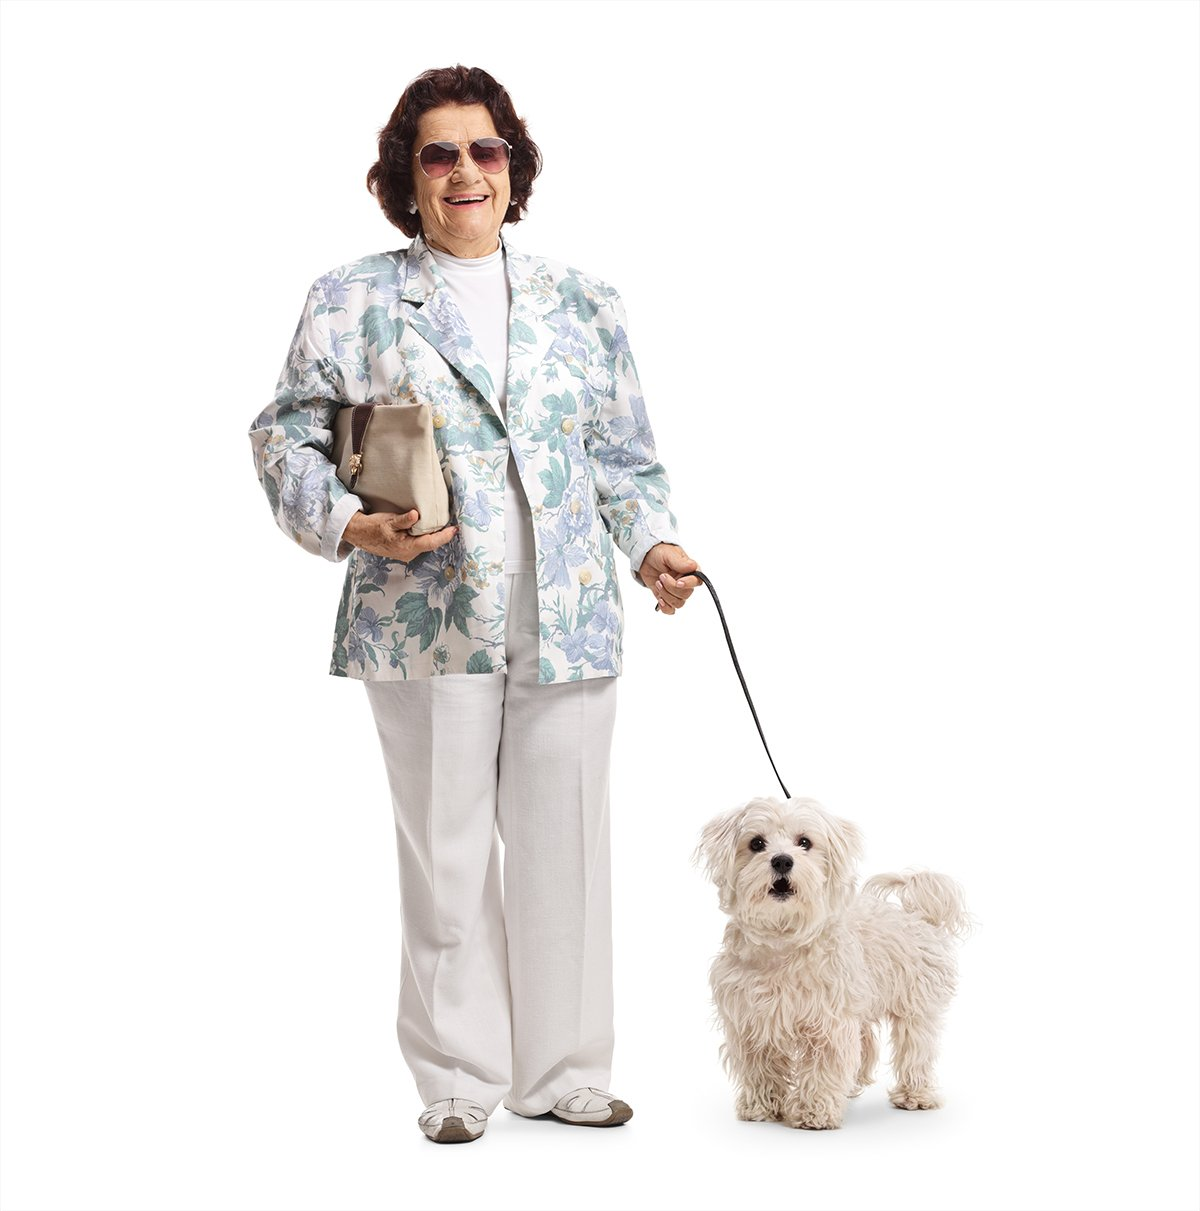 pet friendly senior community